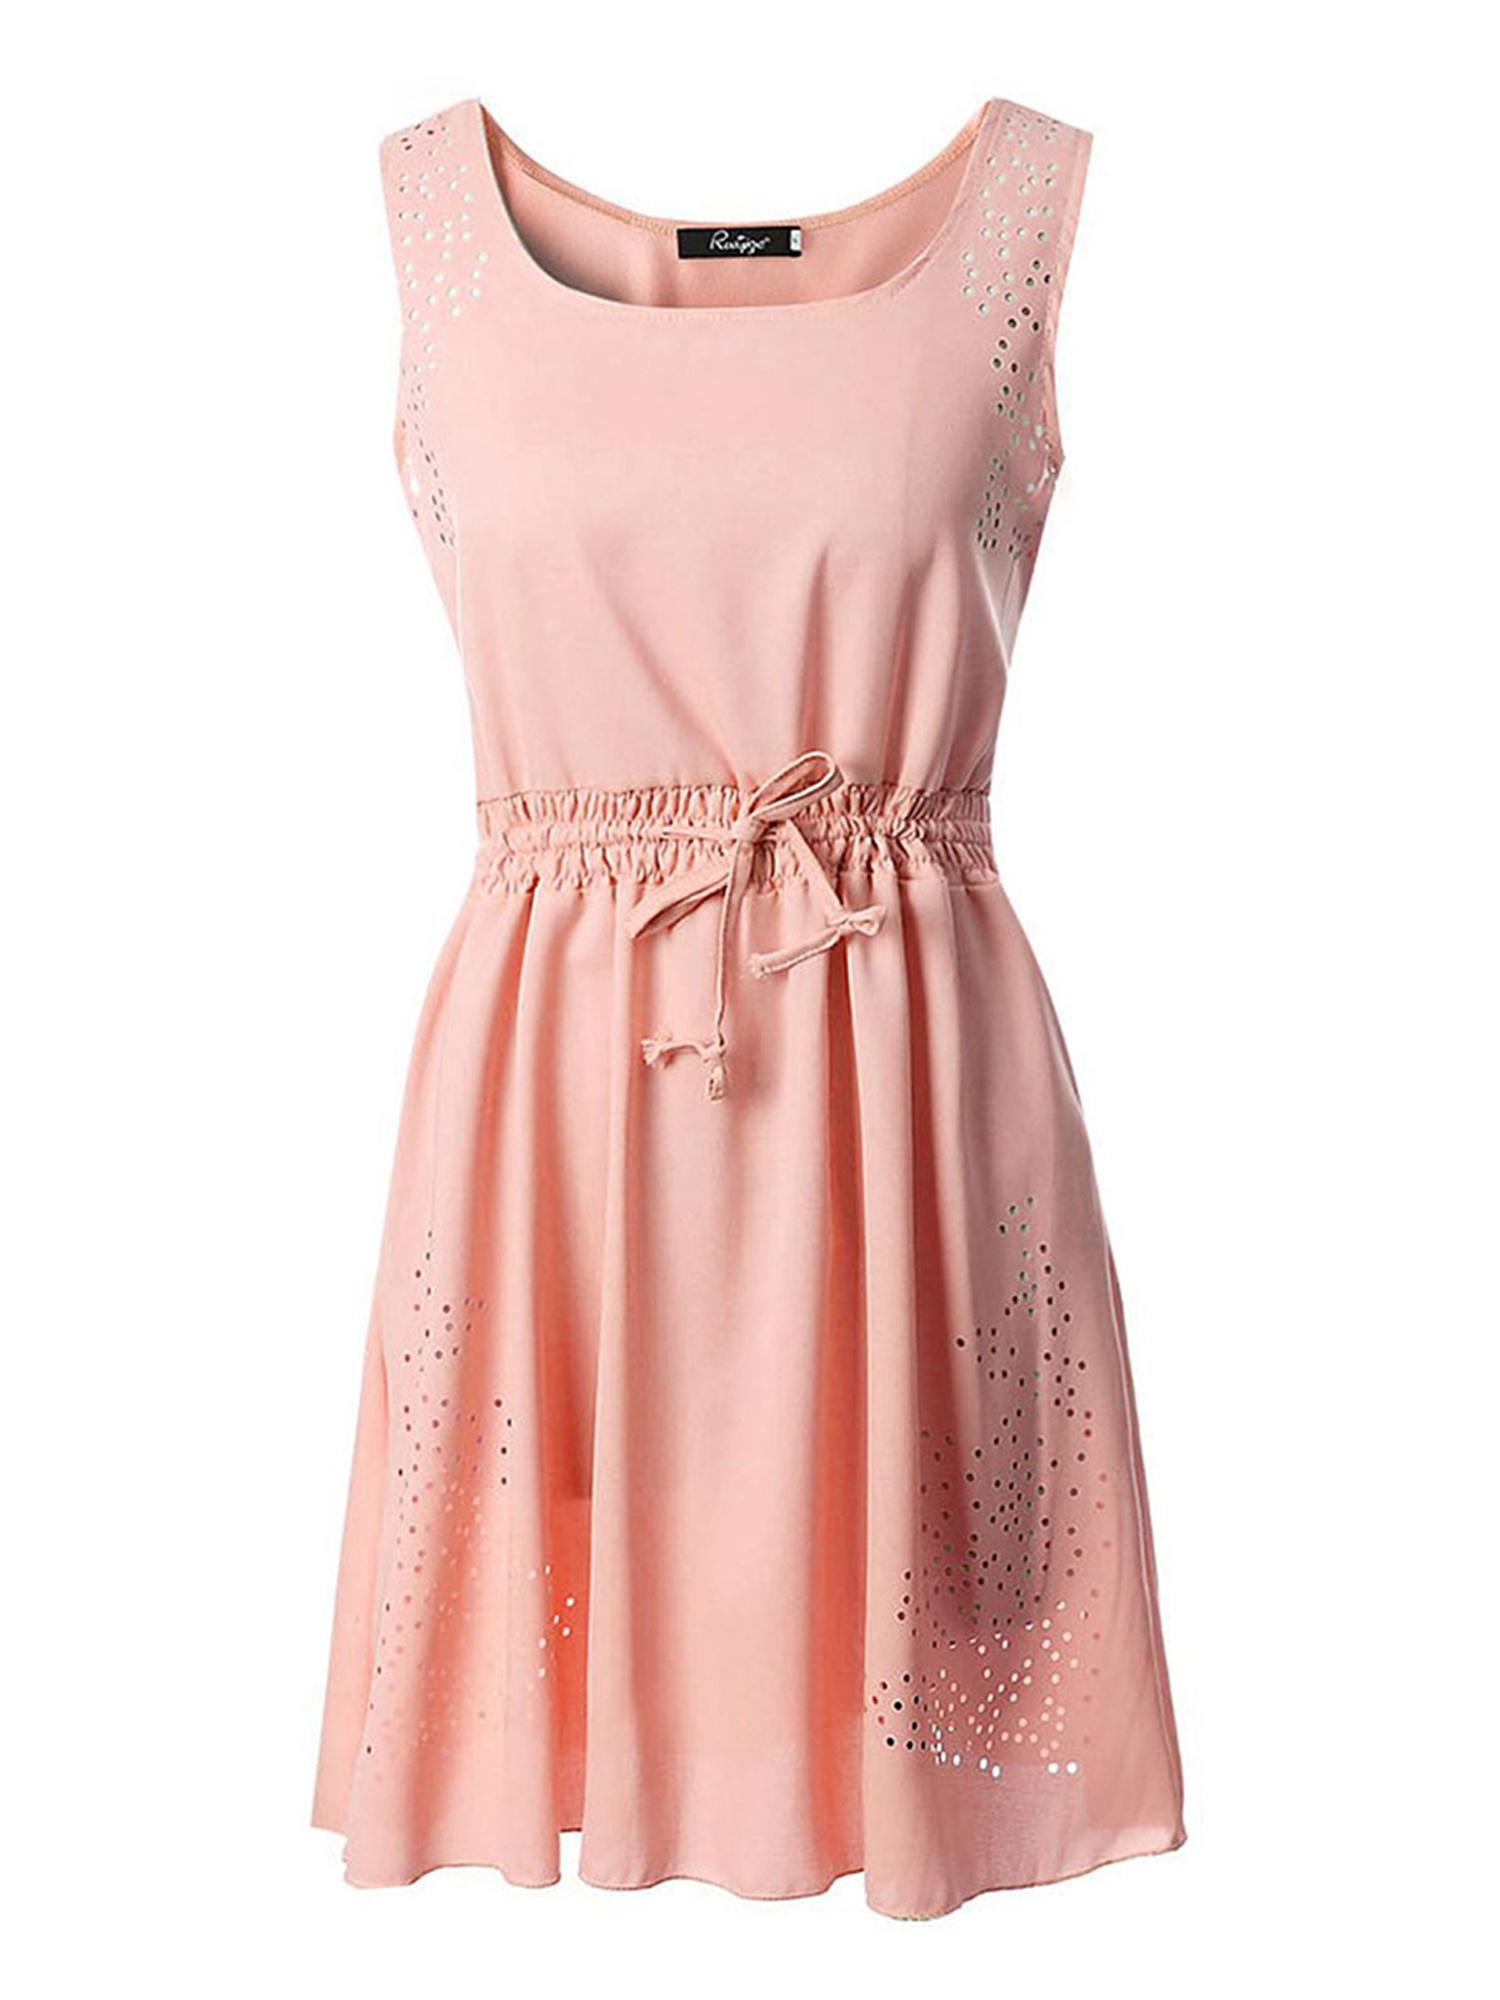 Sexy Dance Summer Dresses for Plus Size Women Chiffon Sleeveless Casual Beach Party Evening Cocktail Short Mini Dress